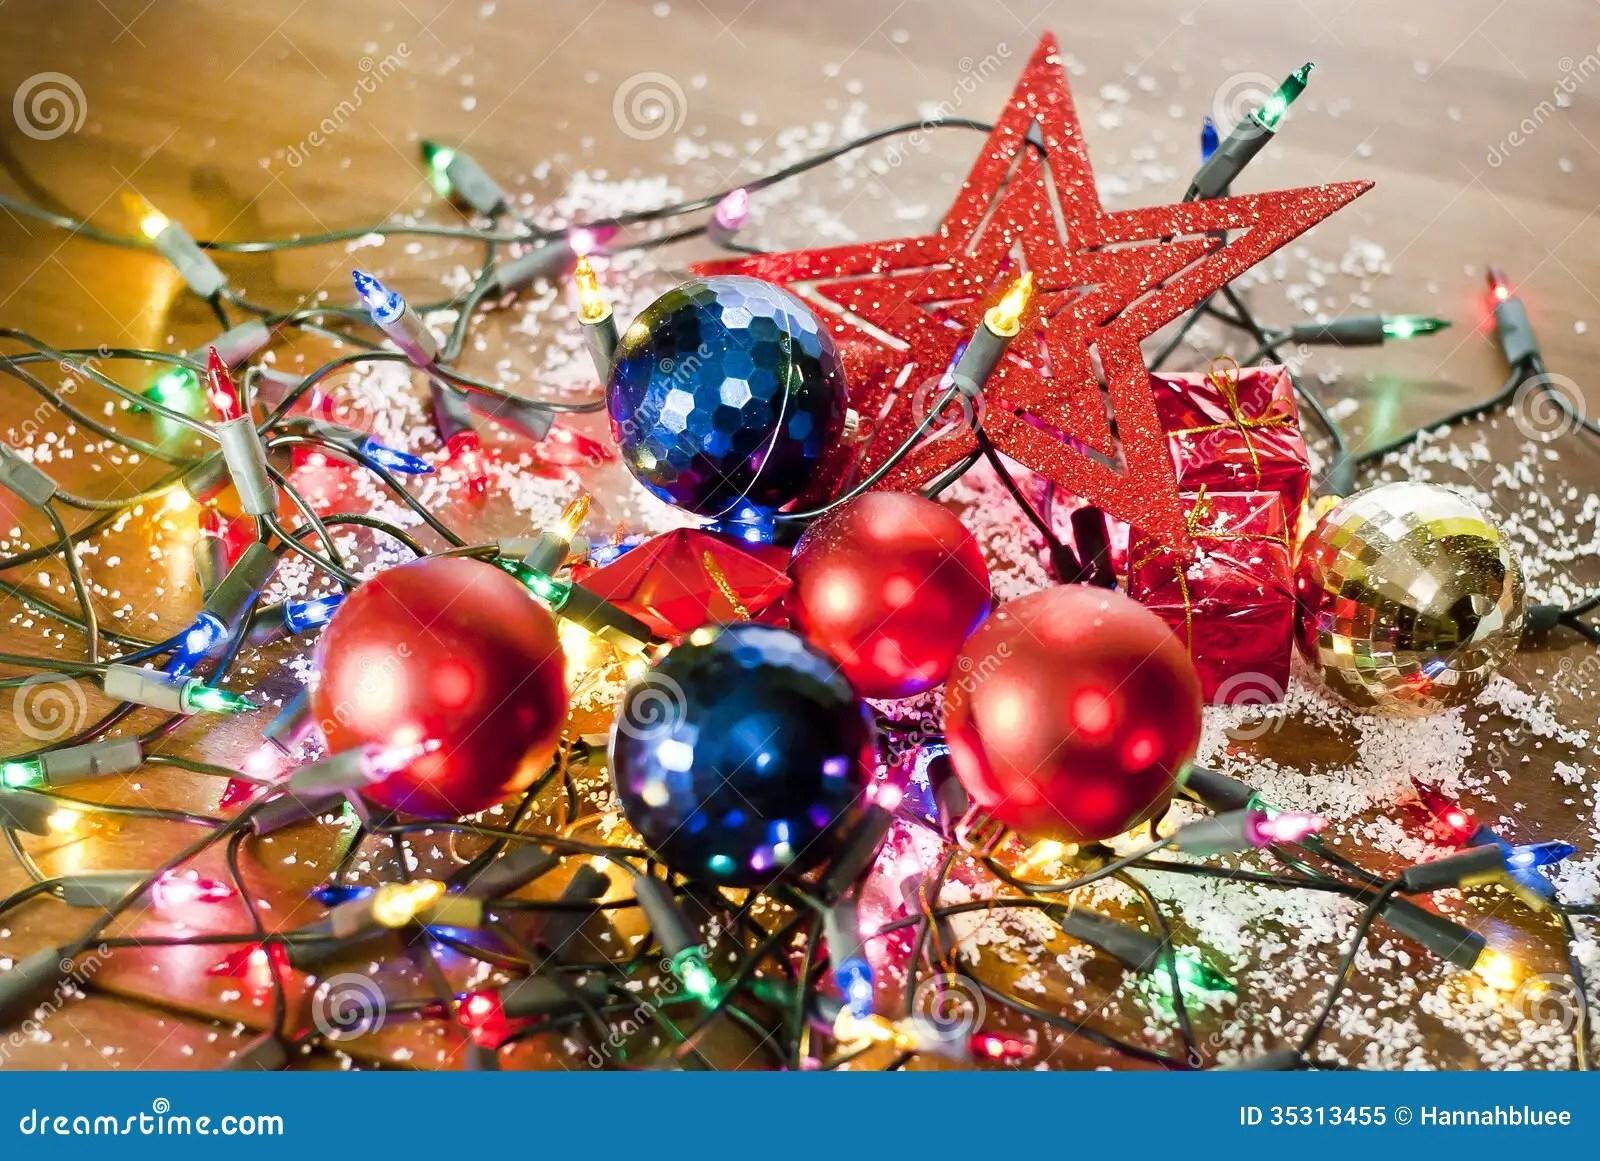 Christmas Mess Royalty Free Stock Photo Image 35313455